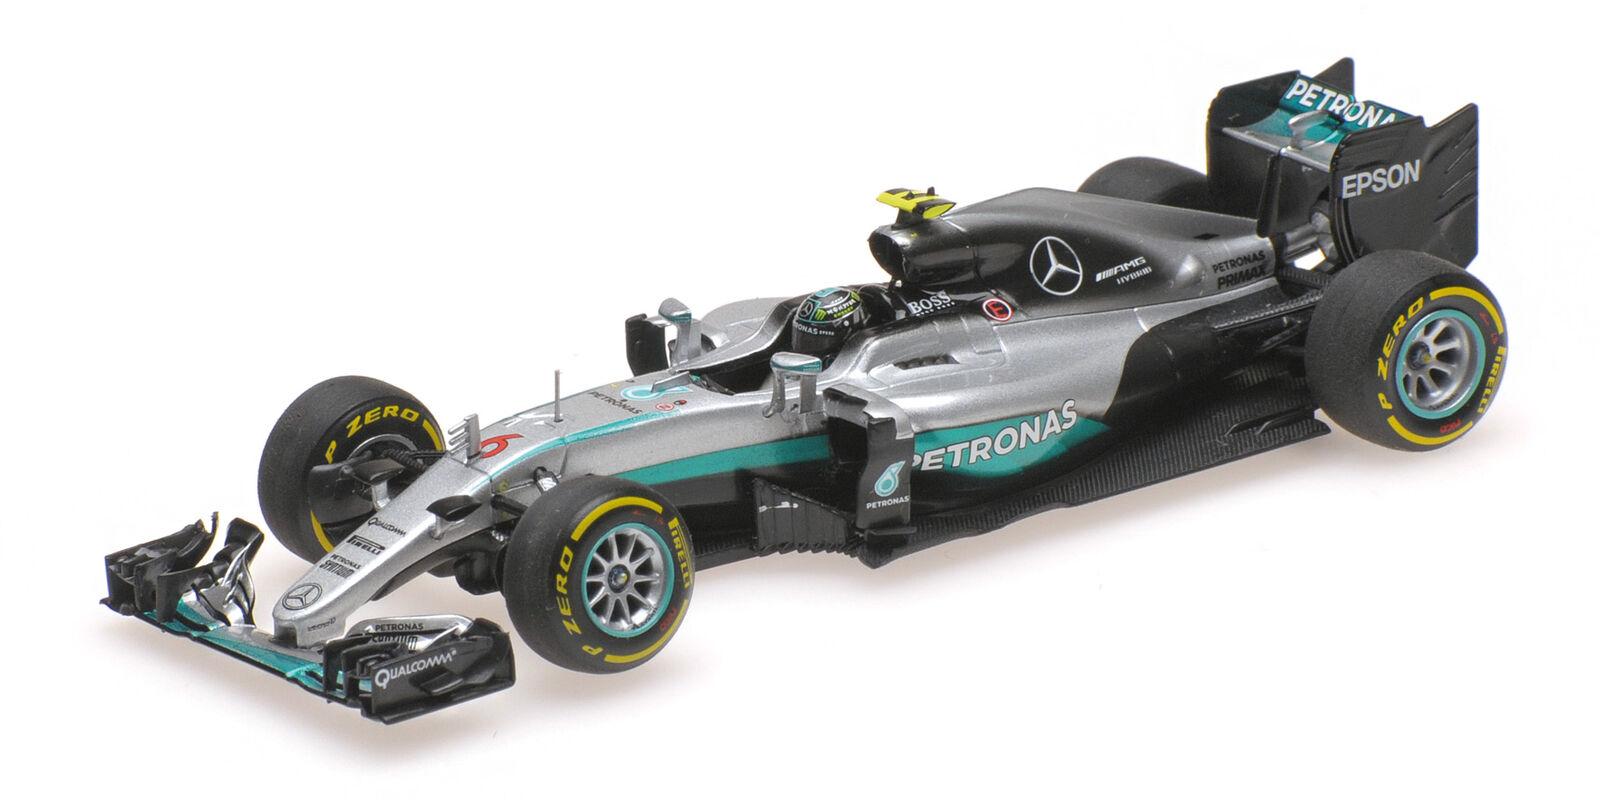 Mercedes Amg W07 Nico Rosberg World Champion 2016 MINICHAMPS 1:43 410160706